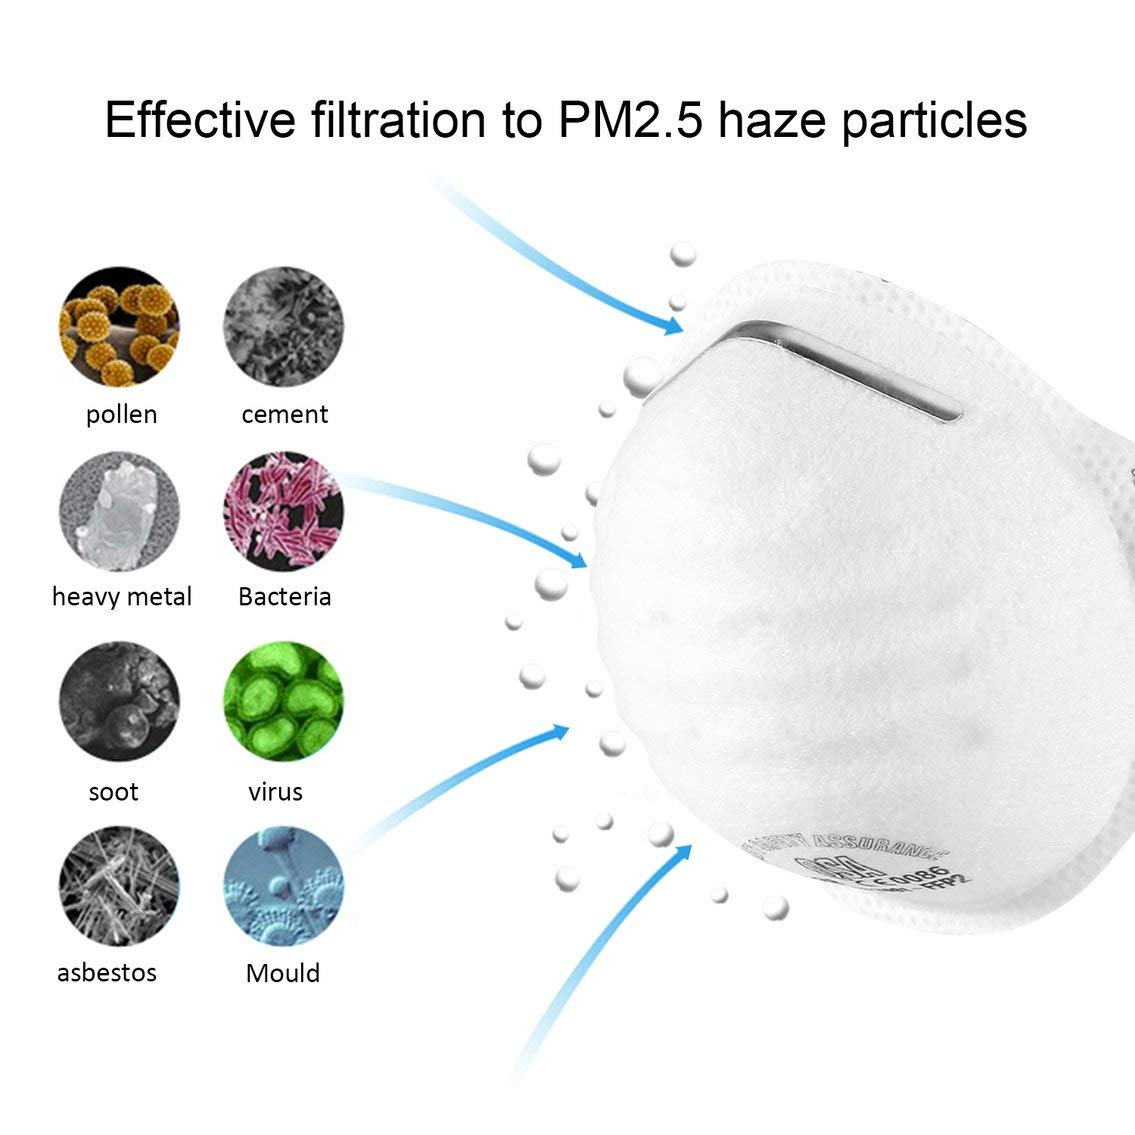 Máscara KN95, máscara anti-polvo FFP2 a prueba de polvo con válvula Máscara de polvo Filtro FFP2 94% de bacterias, protección anti-PM2.5 Máscara de contaminac